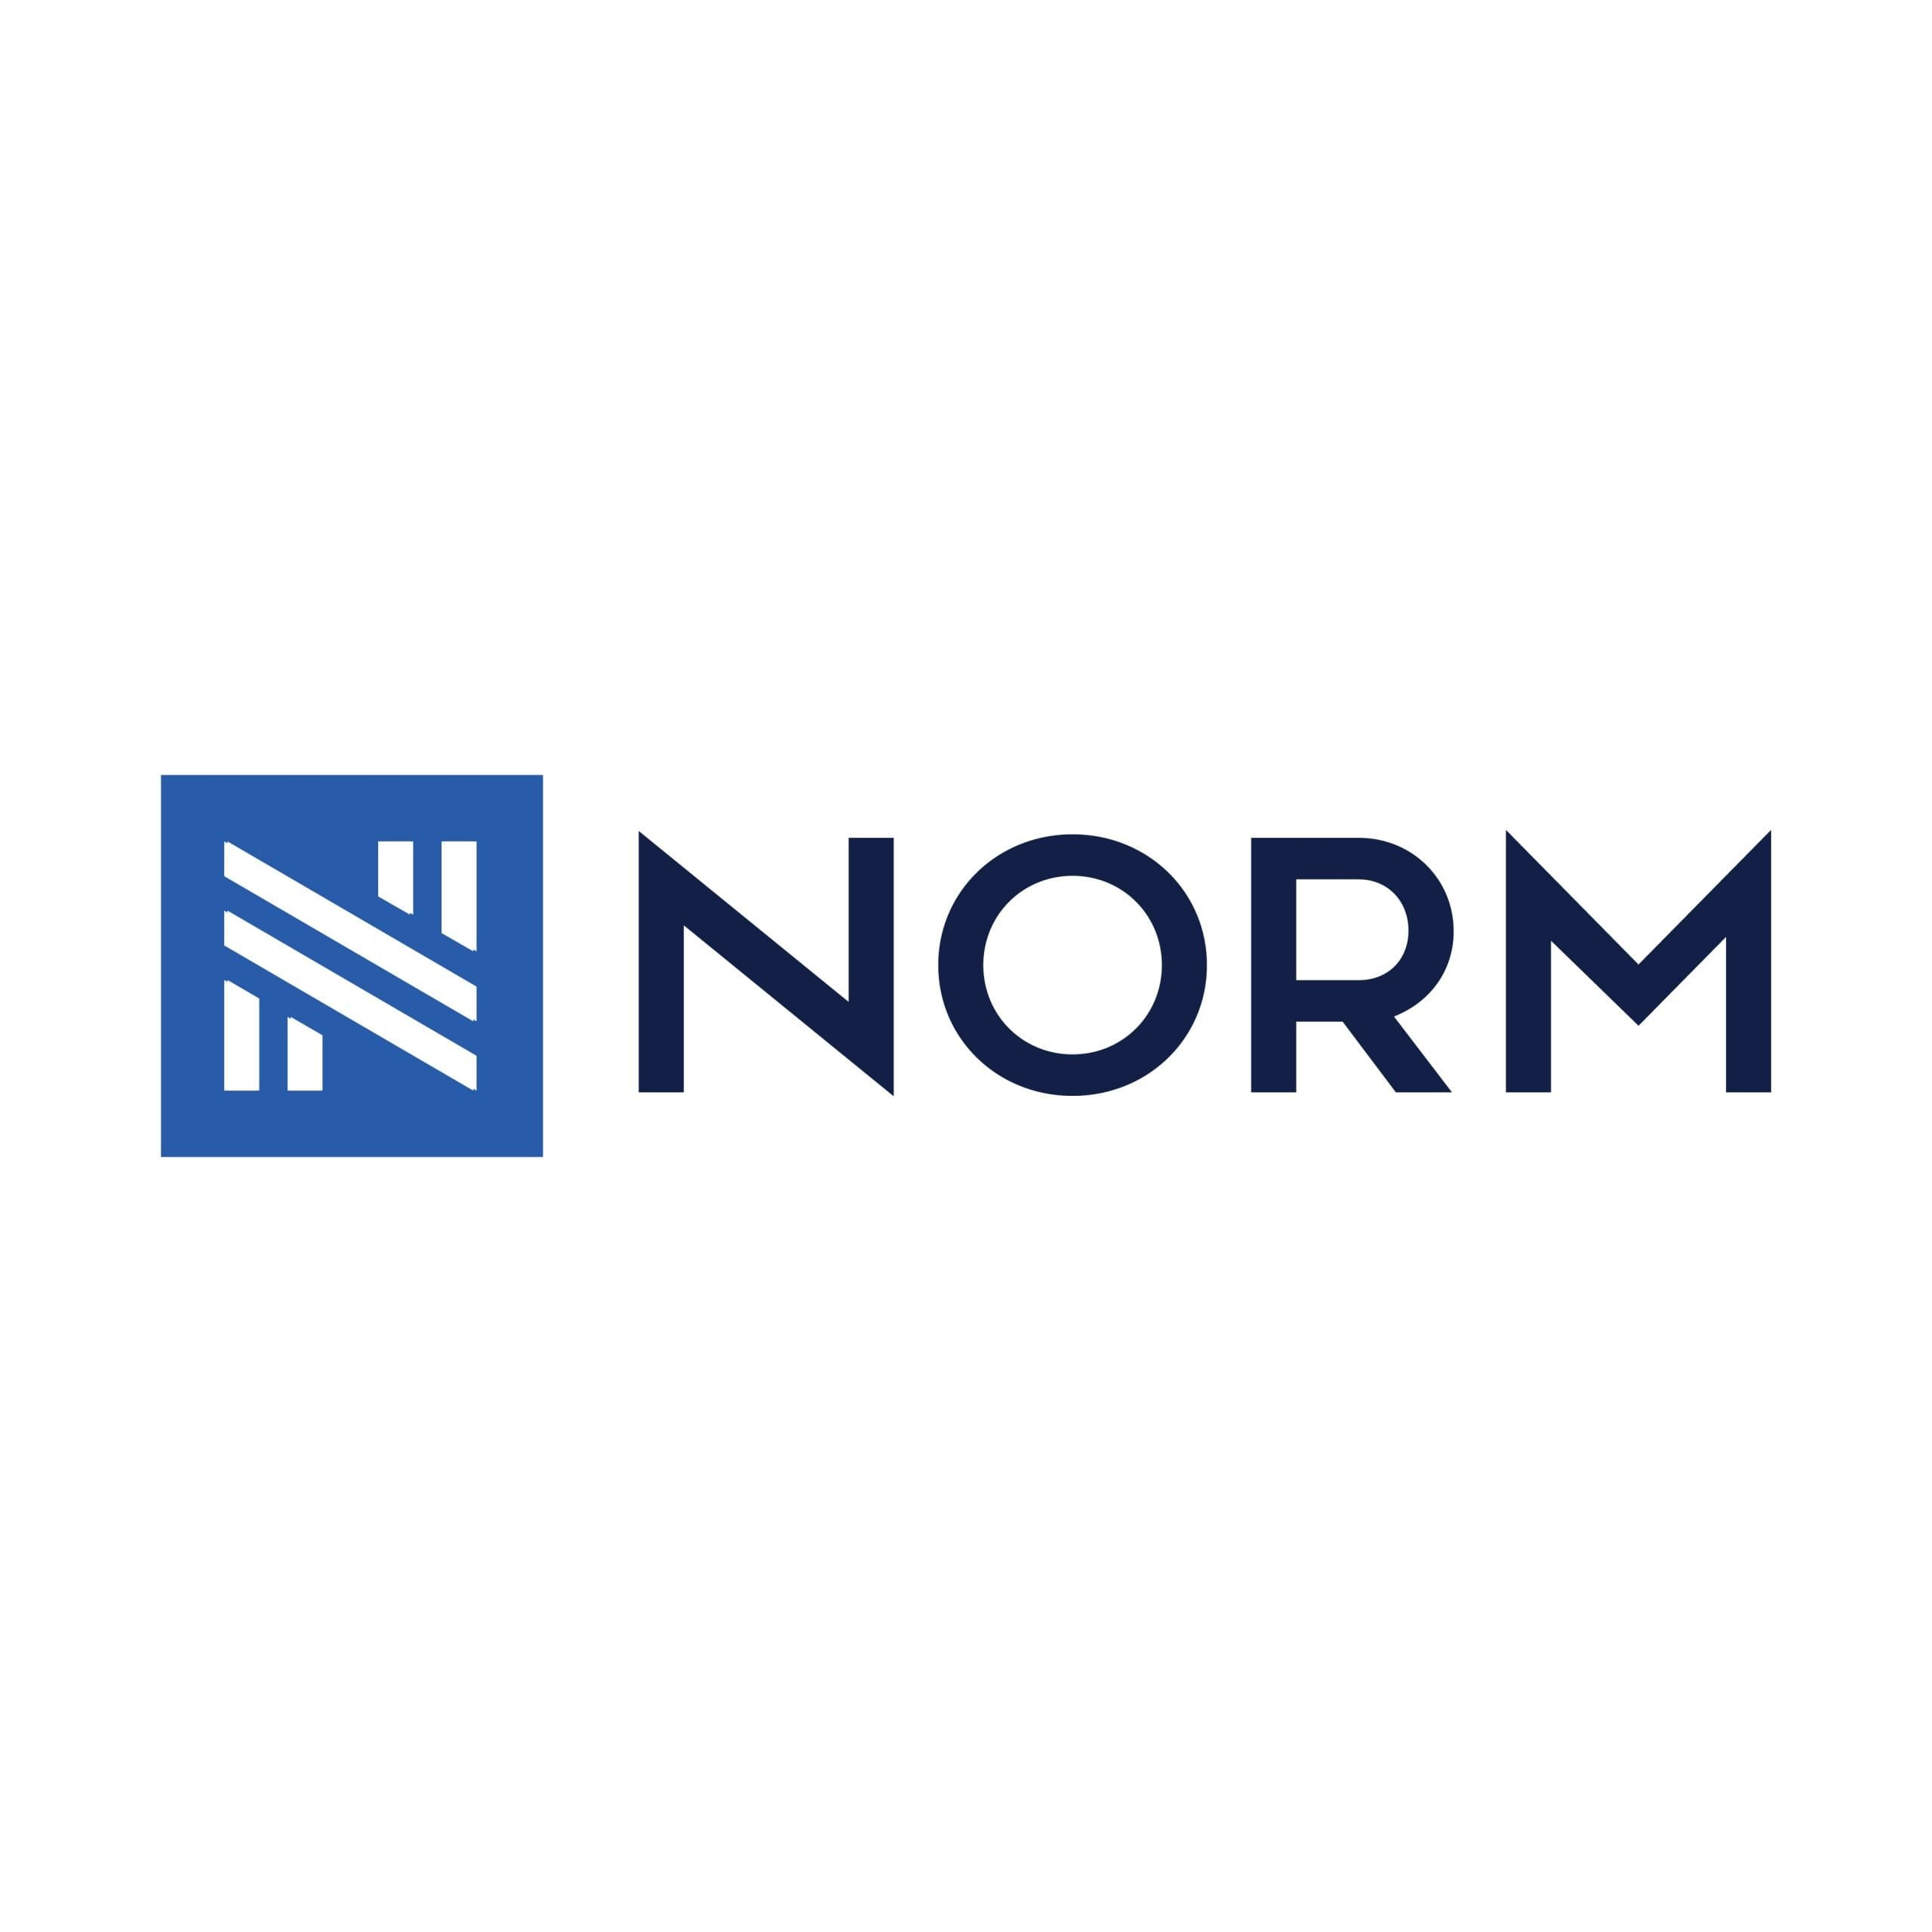 Norm Logo Design